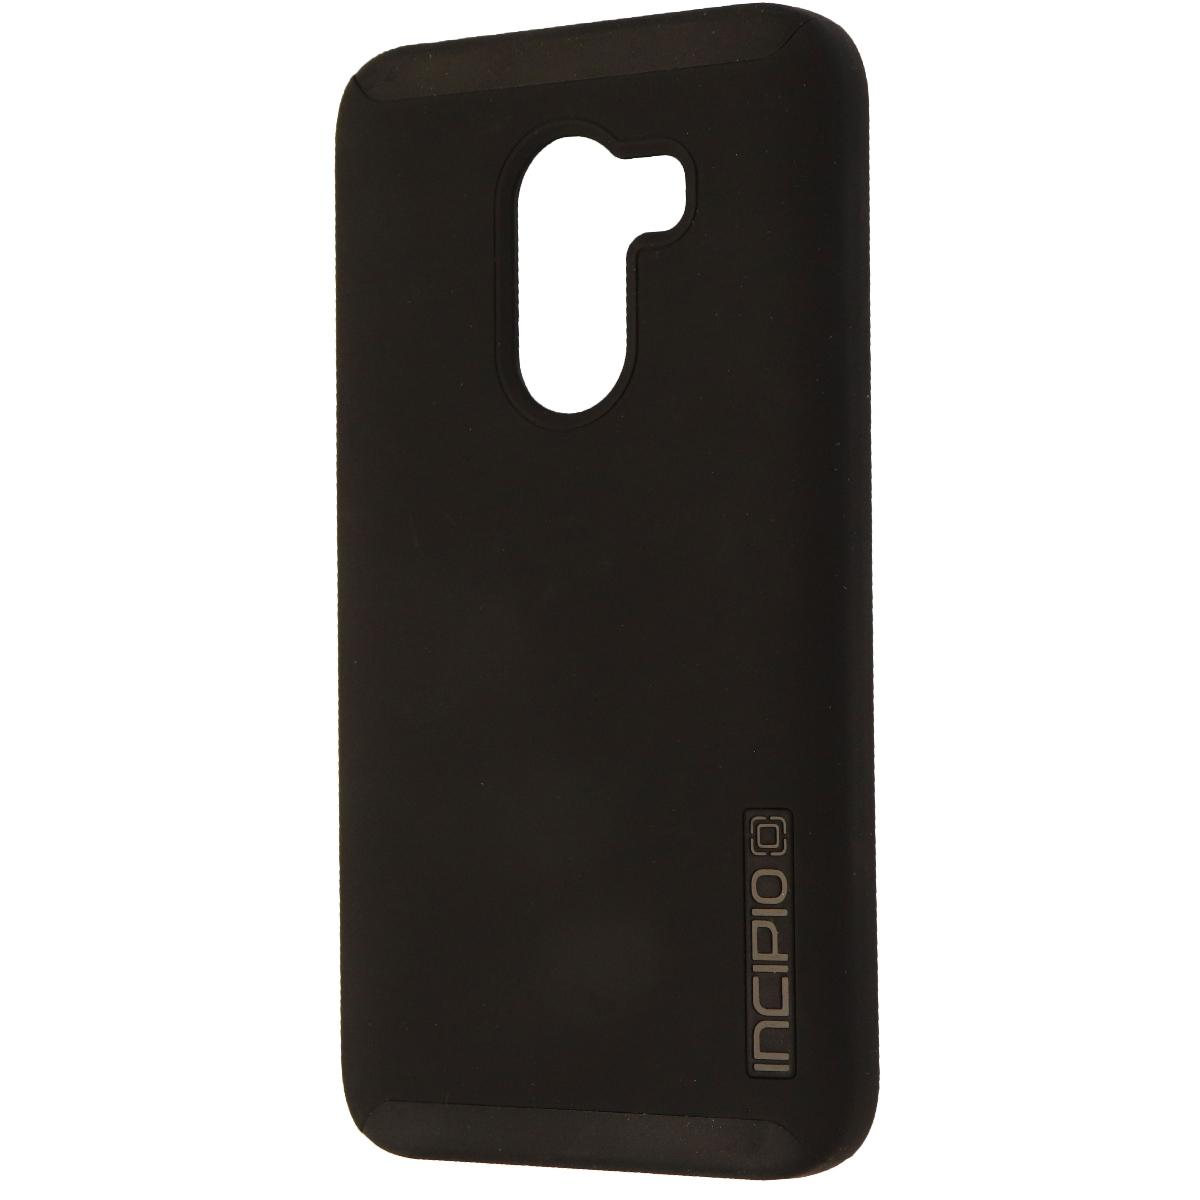 Incipio DualPro Series Dual Layer Case Cover for T-Mobile REVVL - Matte Black